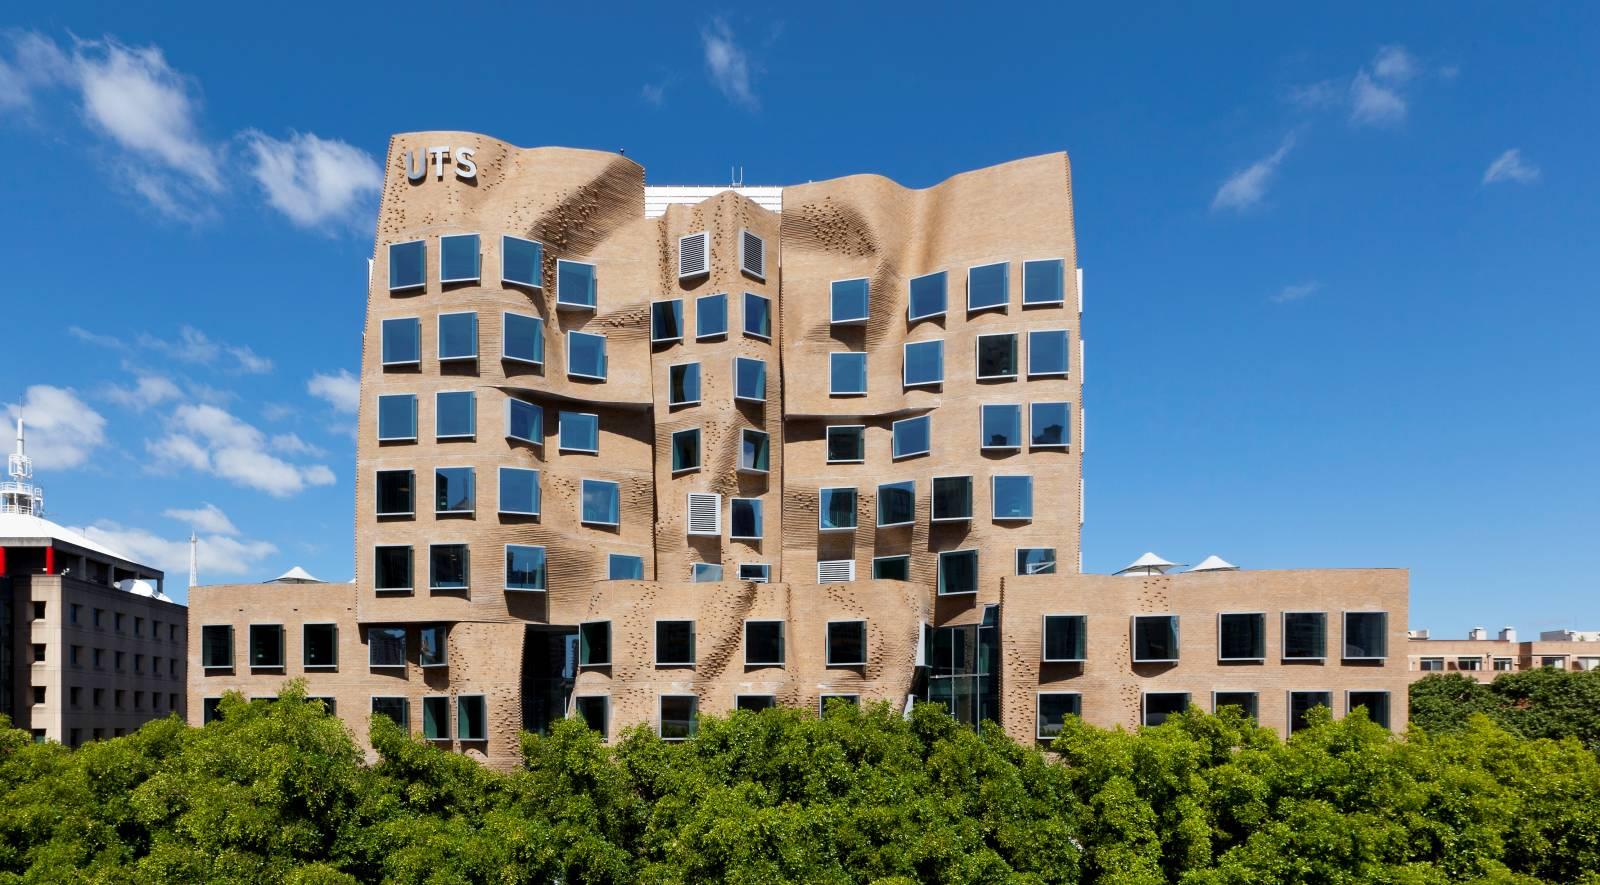 UTS Business School's Frank Gehry building